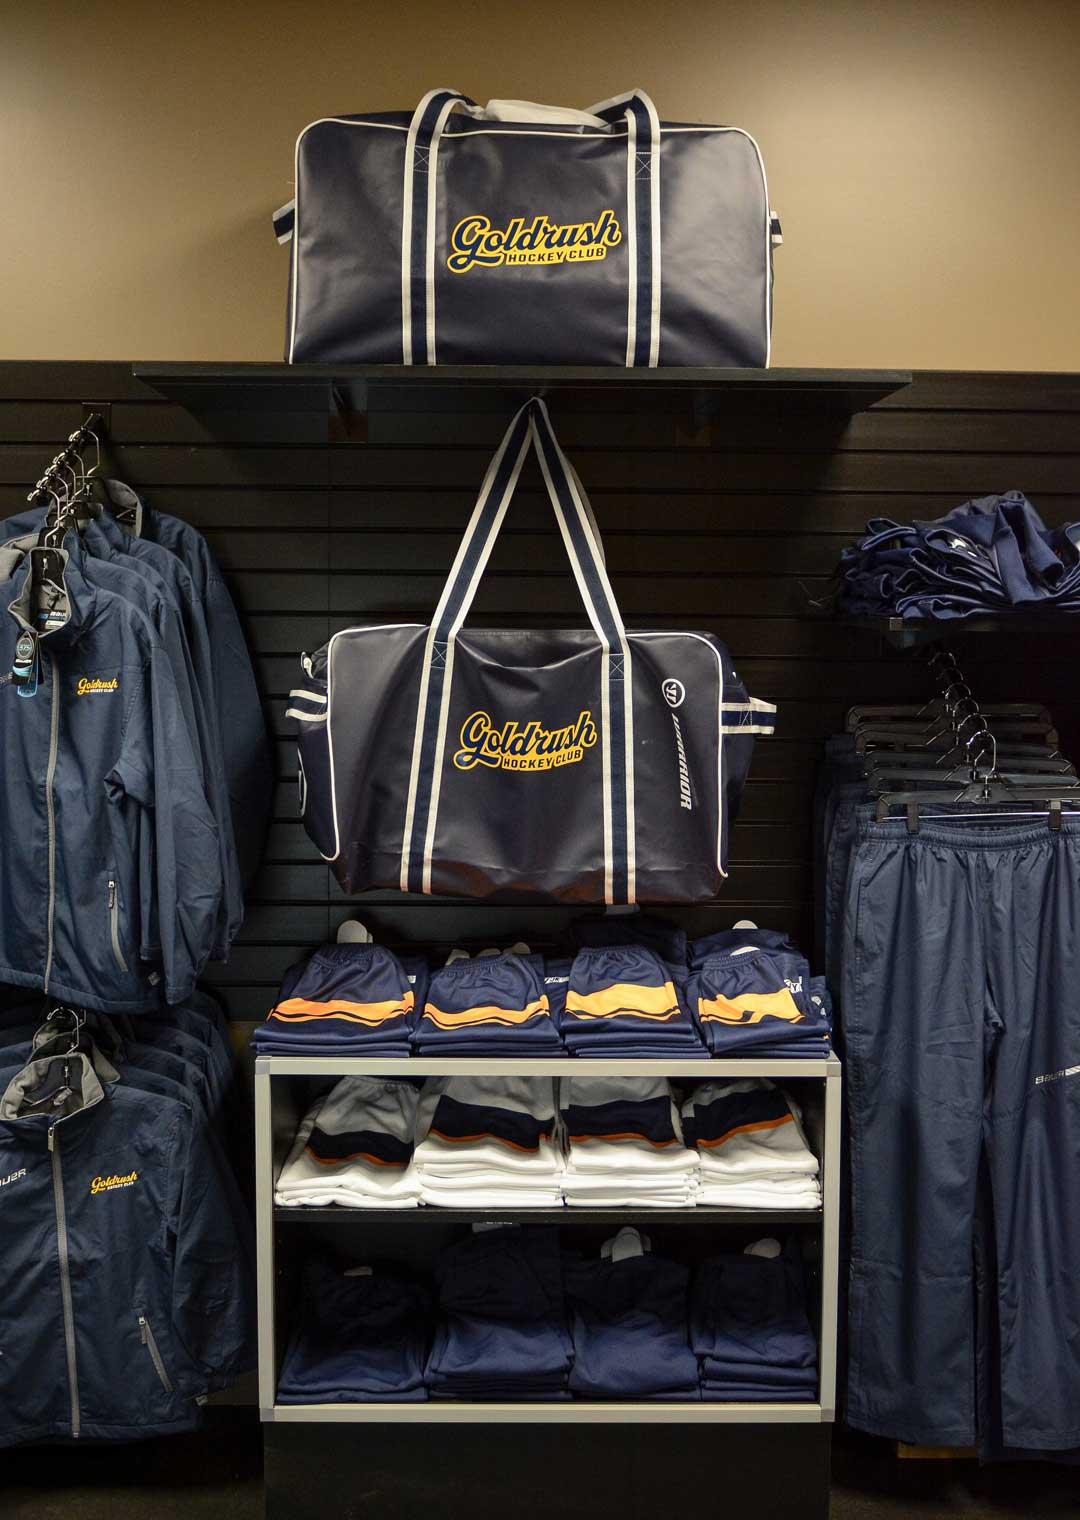 goldrush-hockey-bags-2jpg